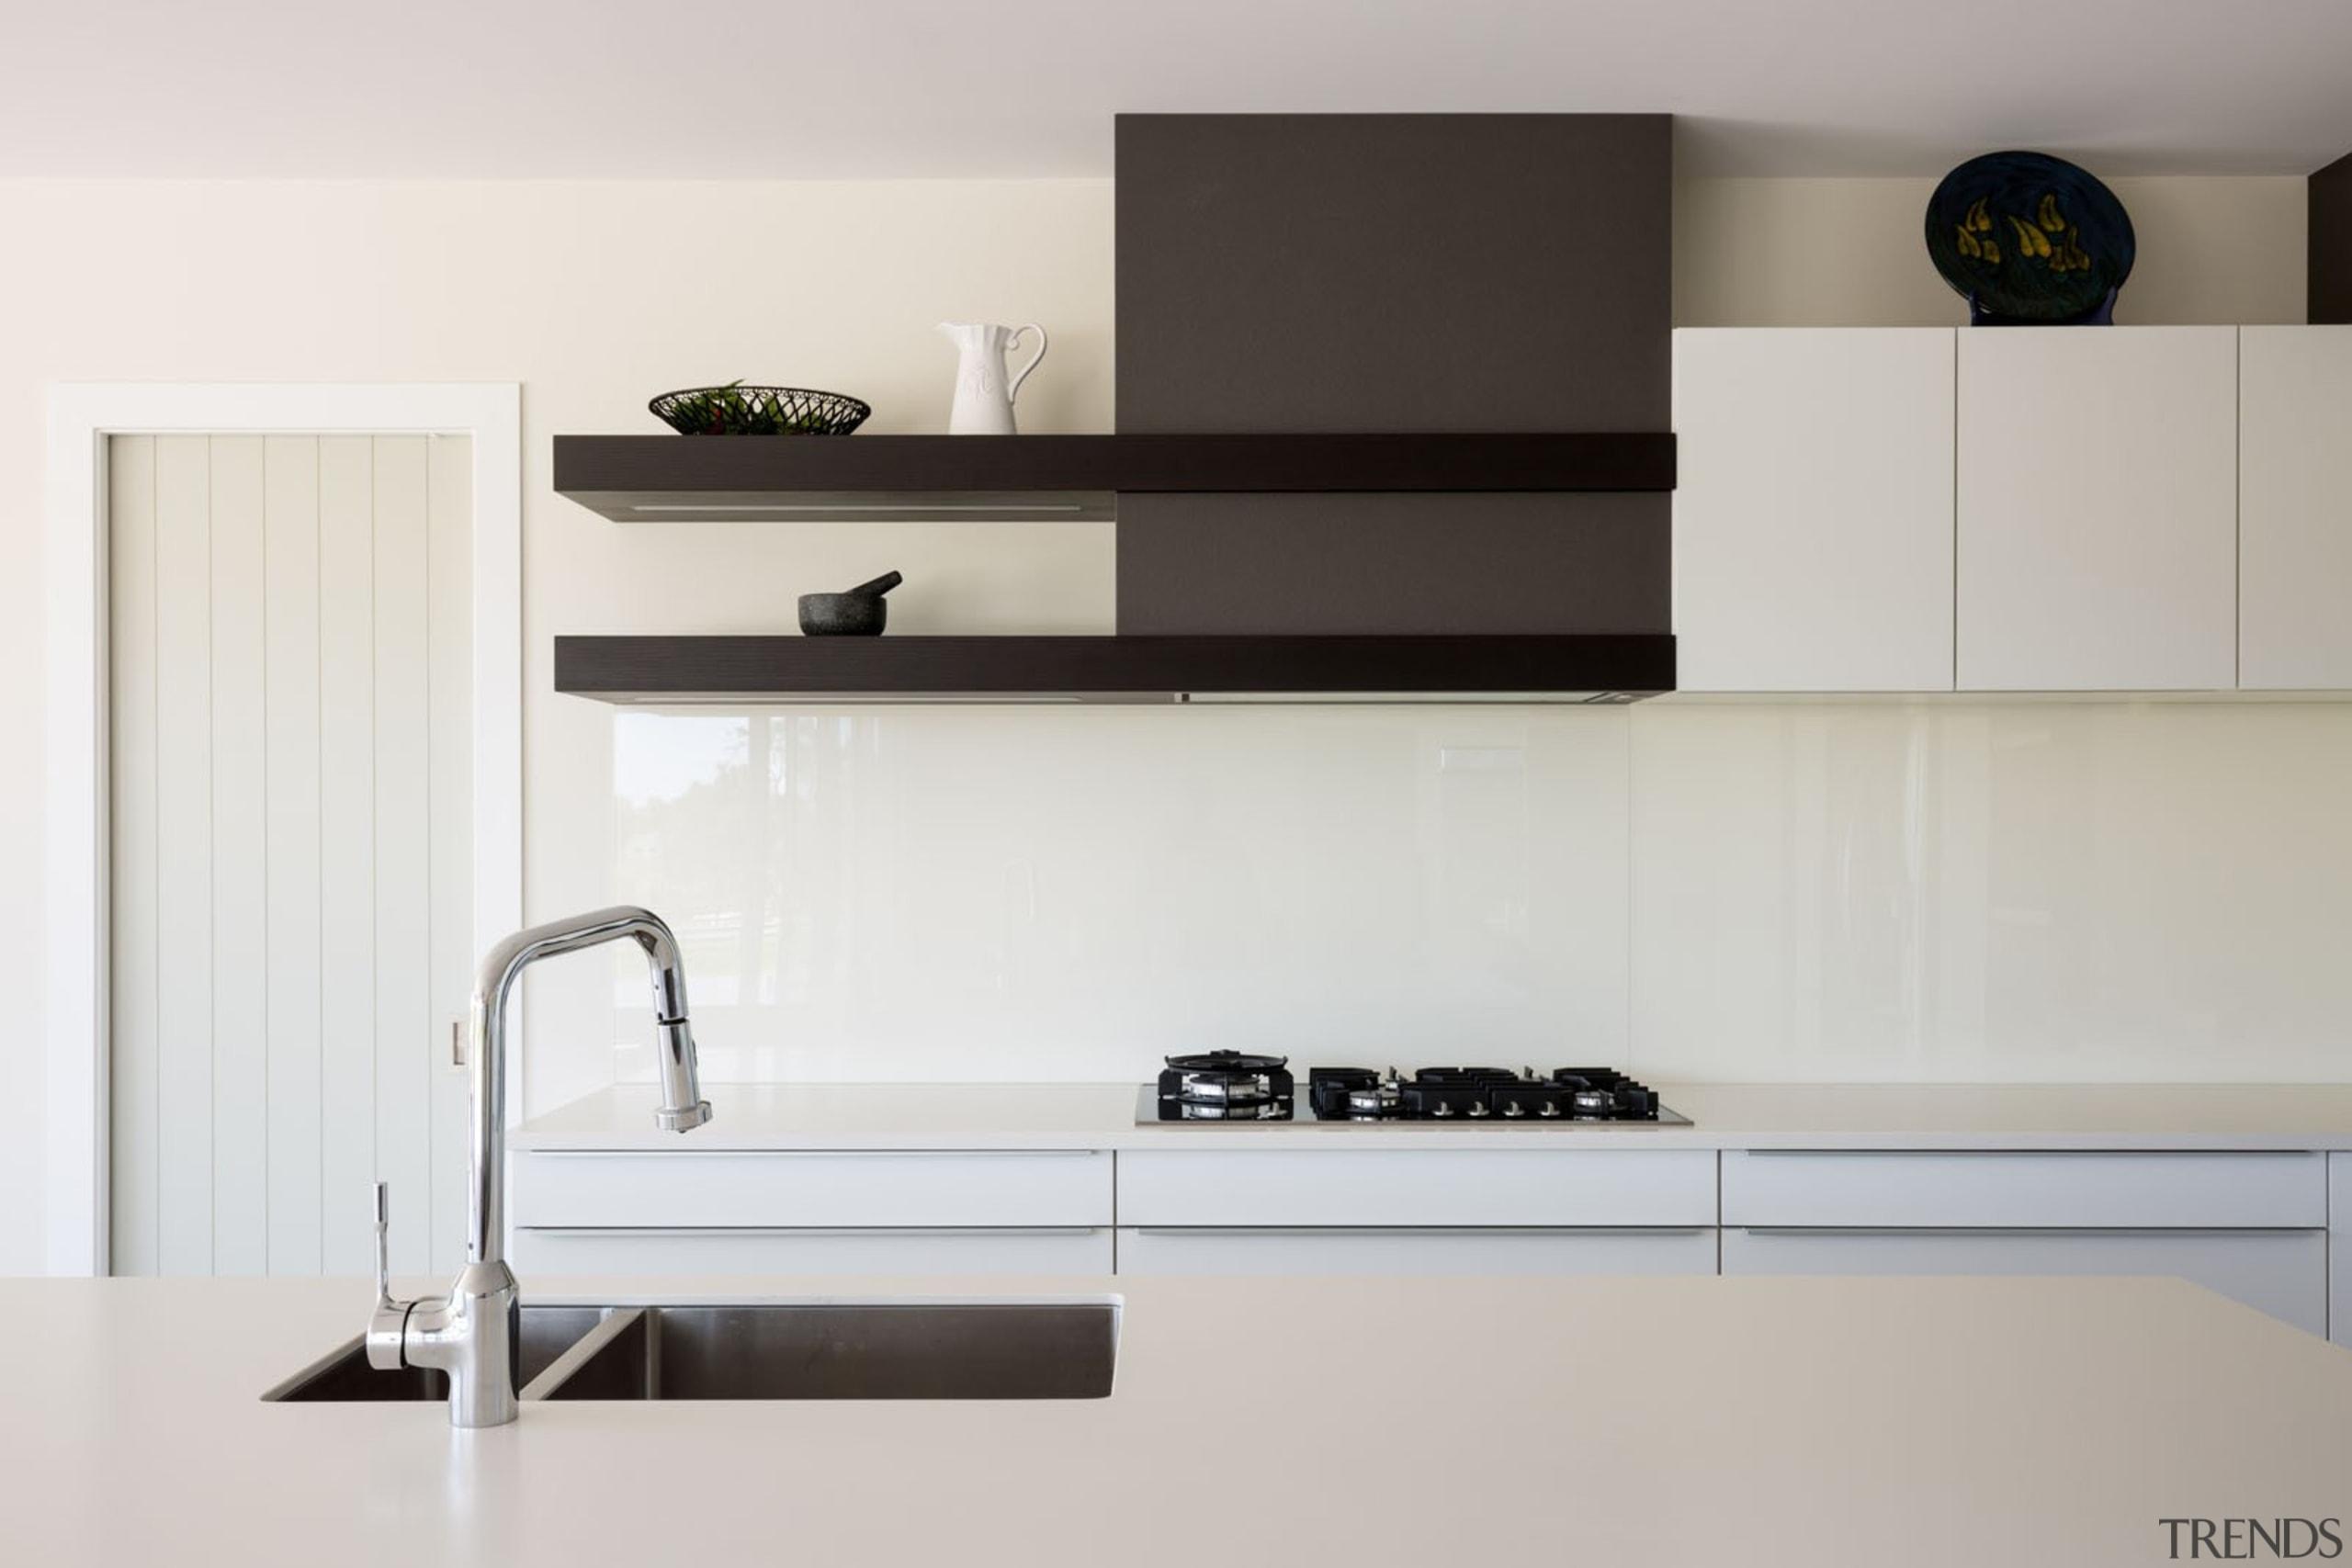 IMGL9867-15 - Dairy Flat Kitchen - furniture | furniture, kitchen, product, product design, shelf, shelving, tap, wall, gray